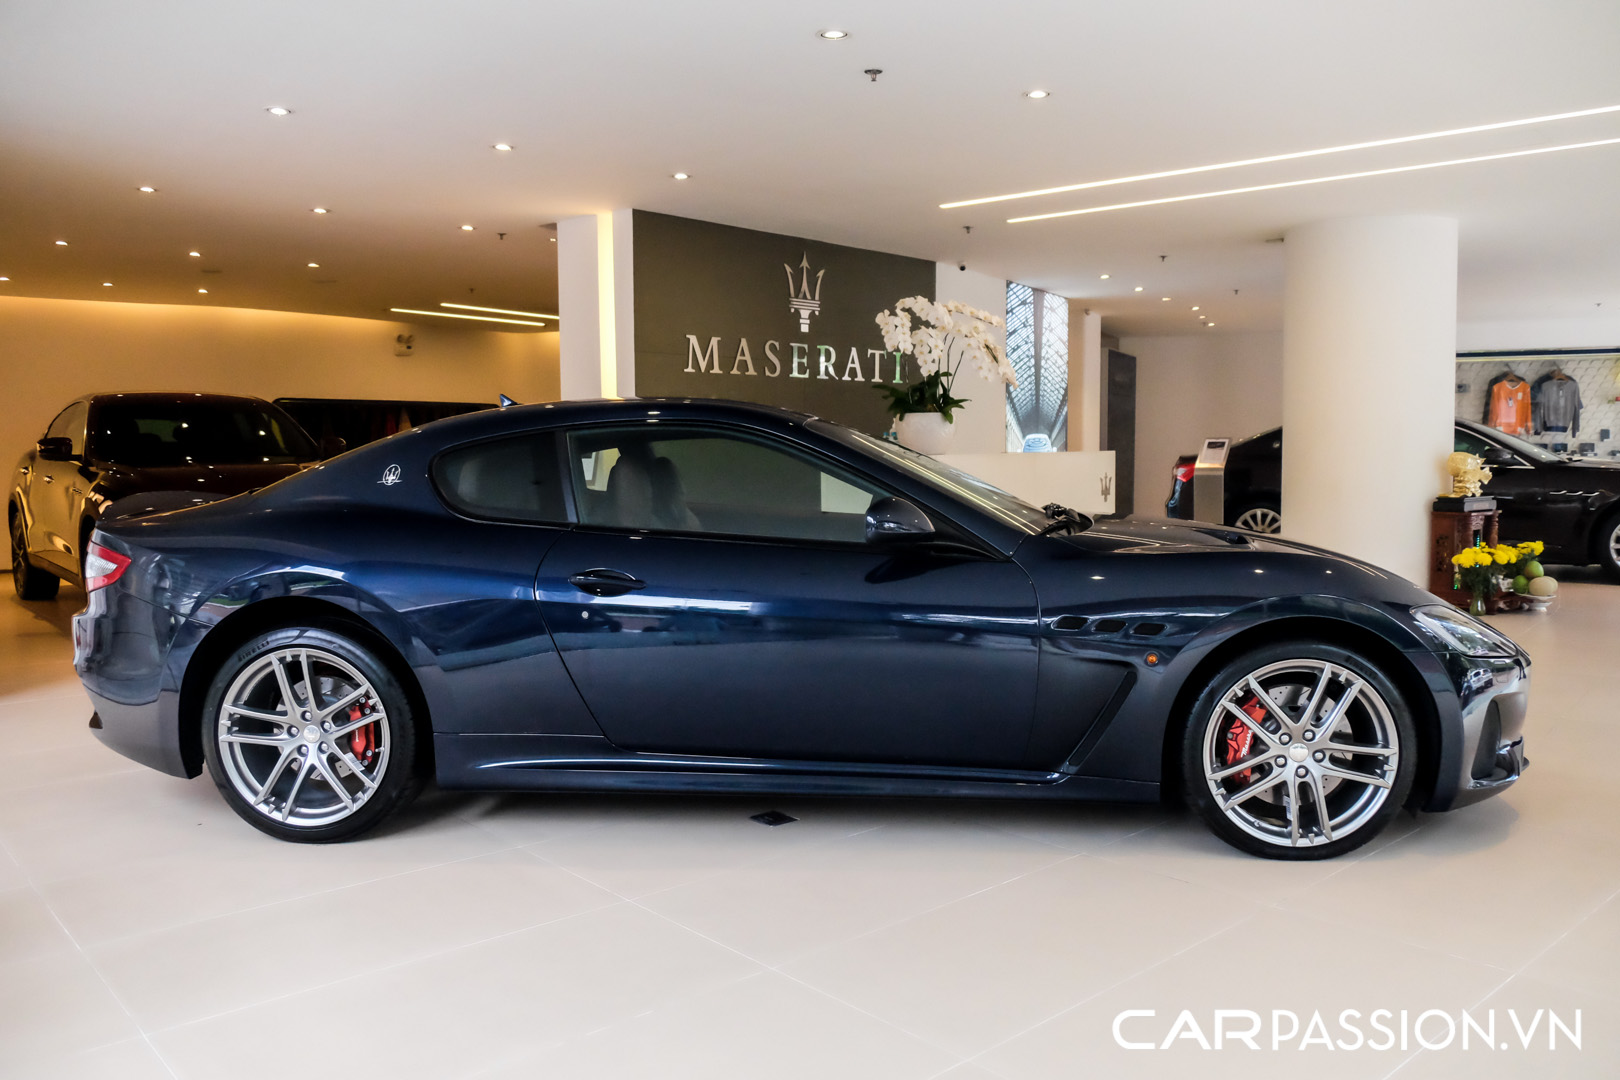 CP- Maserati GranTurismo Sport facelift17.JPG